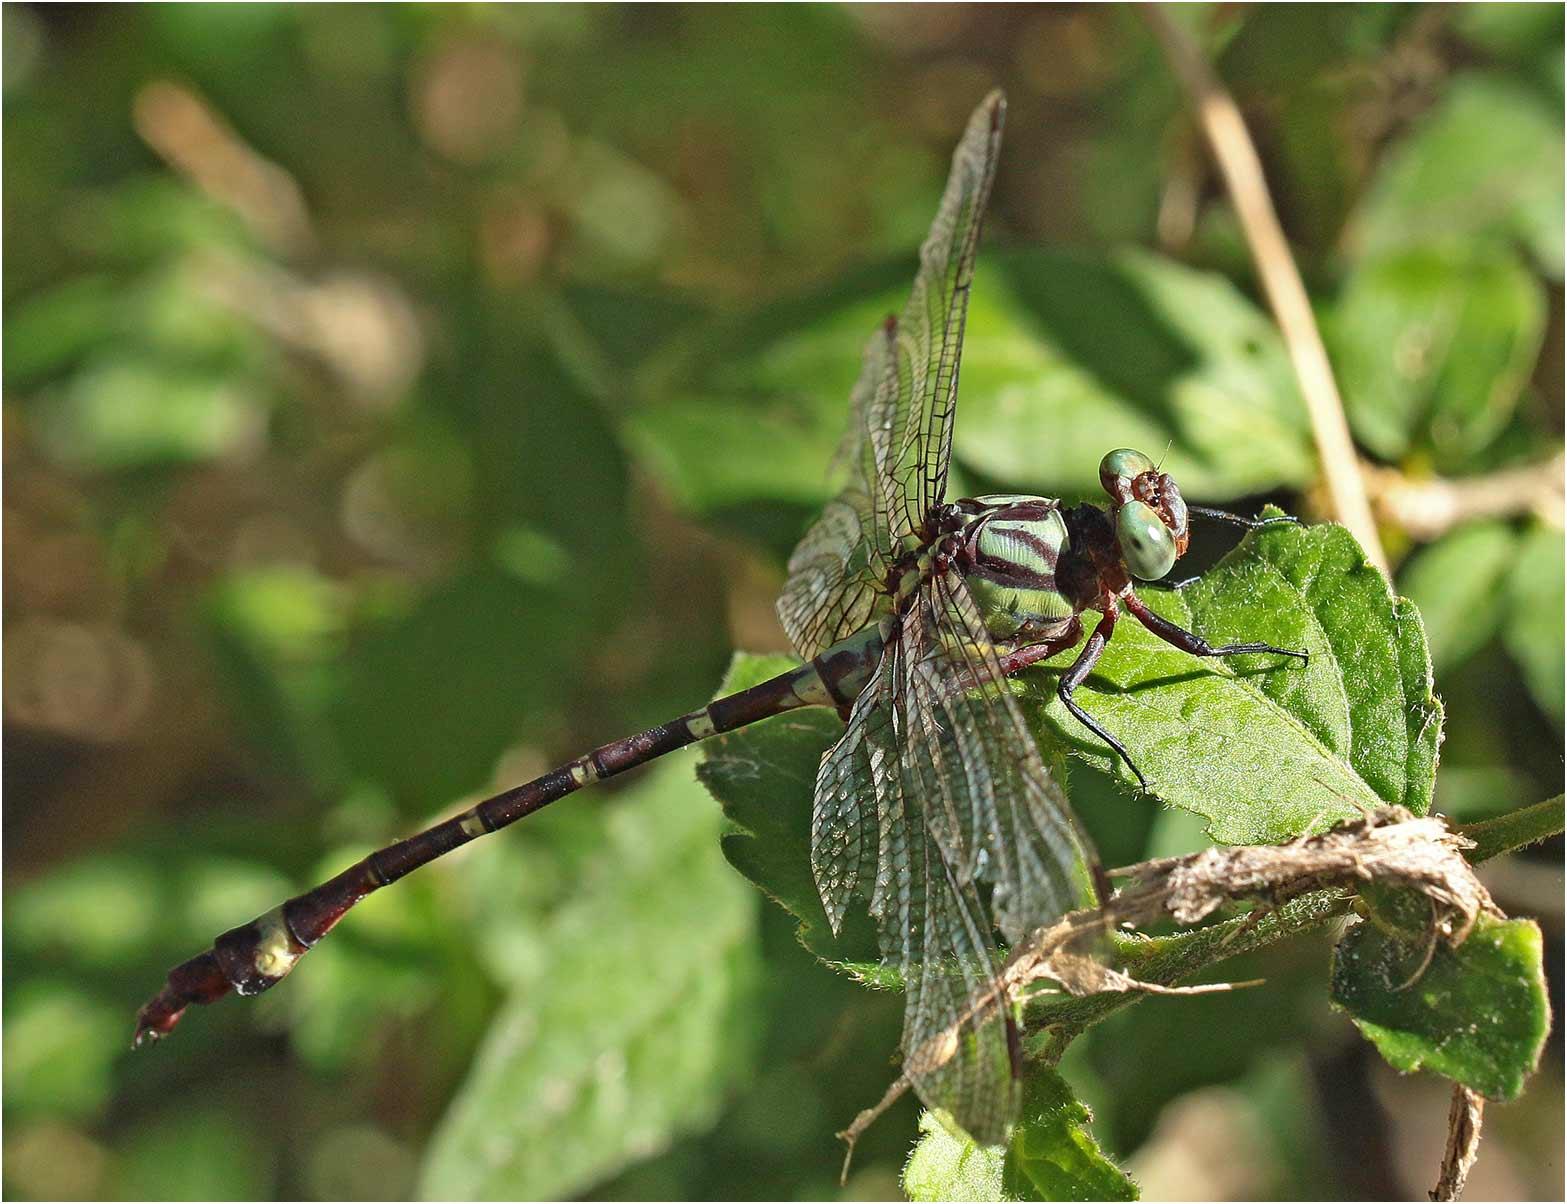 Neurogomphus zambeziensis mâle, Namibie, Katima Mulilo, Wenela border post, le long rapides du Zambèze